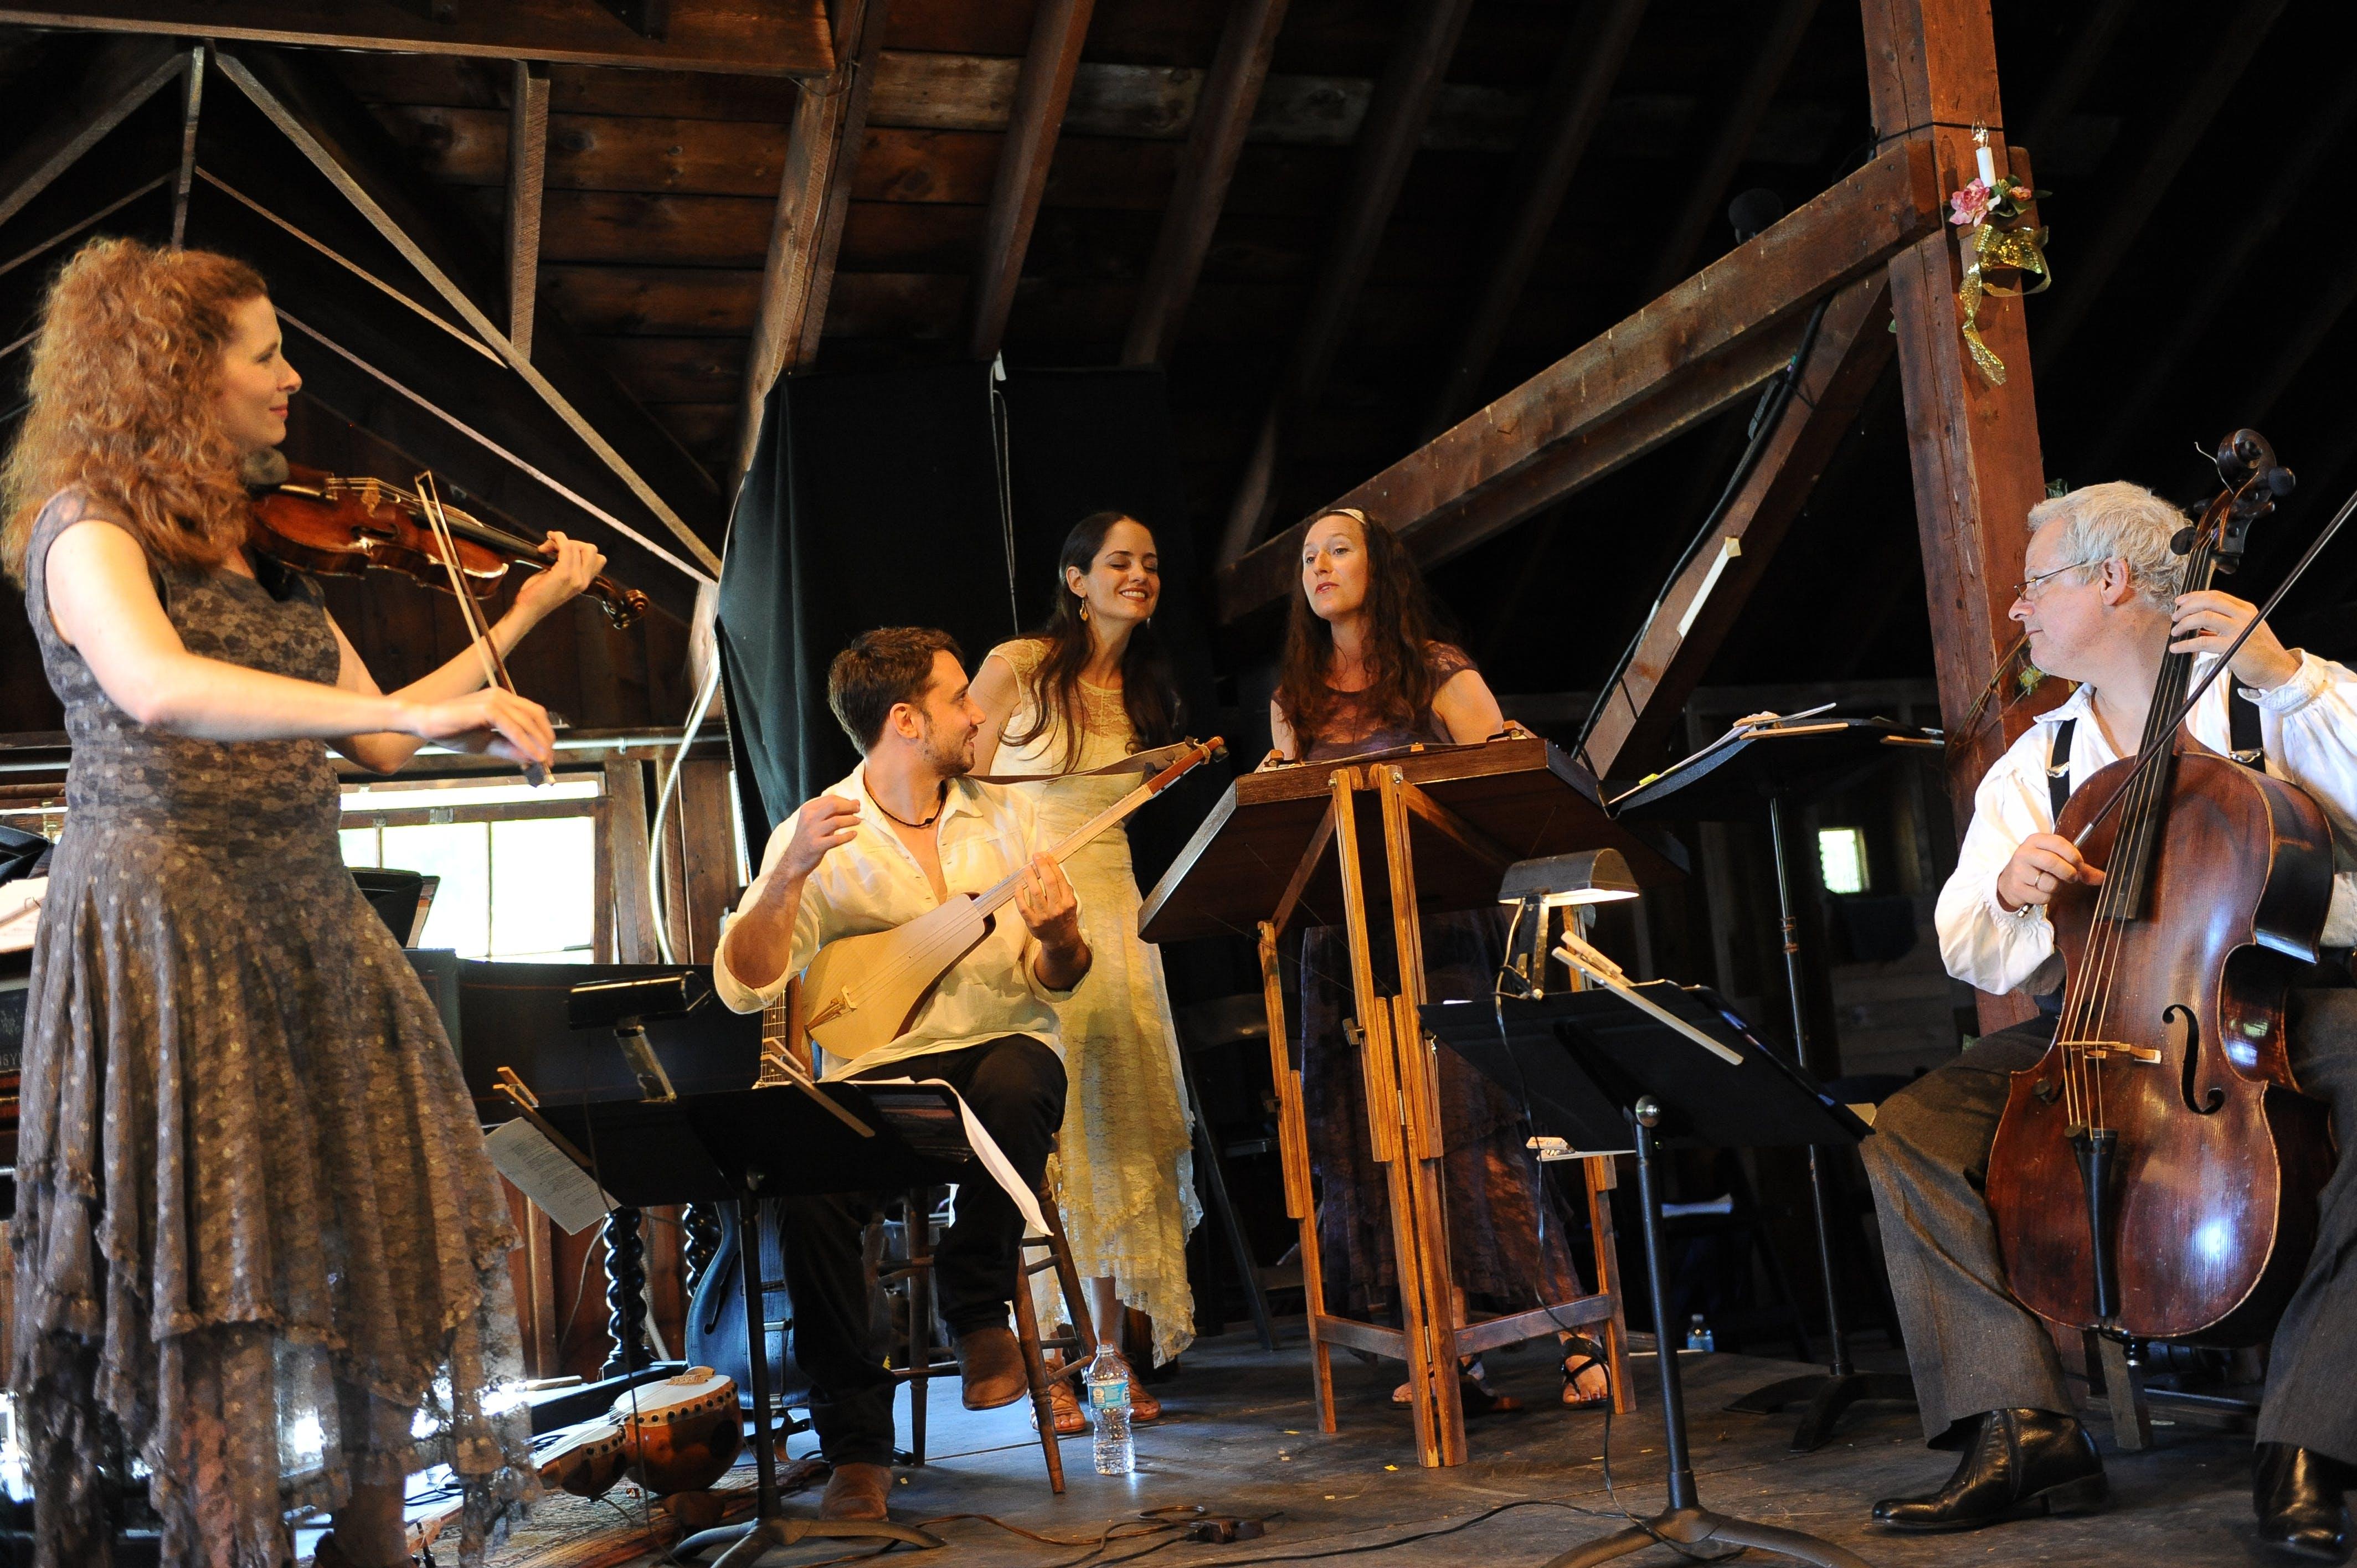 <p><em>Photo courtesy of Apollo&rsquo;s Fire Baroque Orchestra. PhotobyDebra-LynnHook. </em></p>